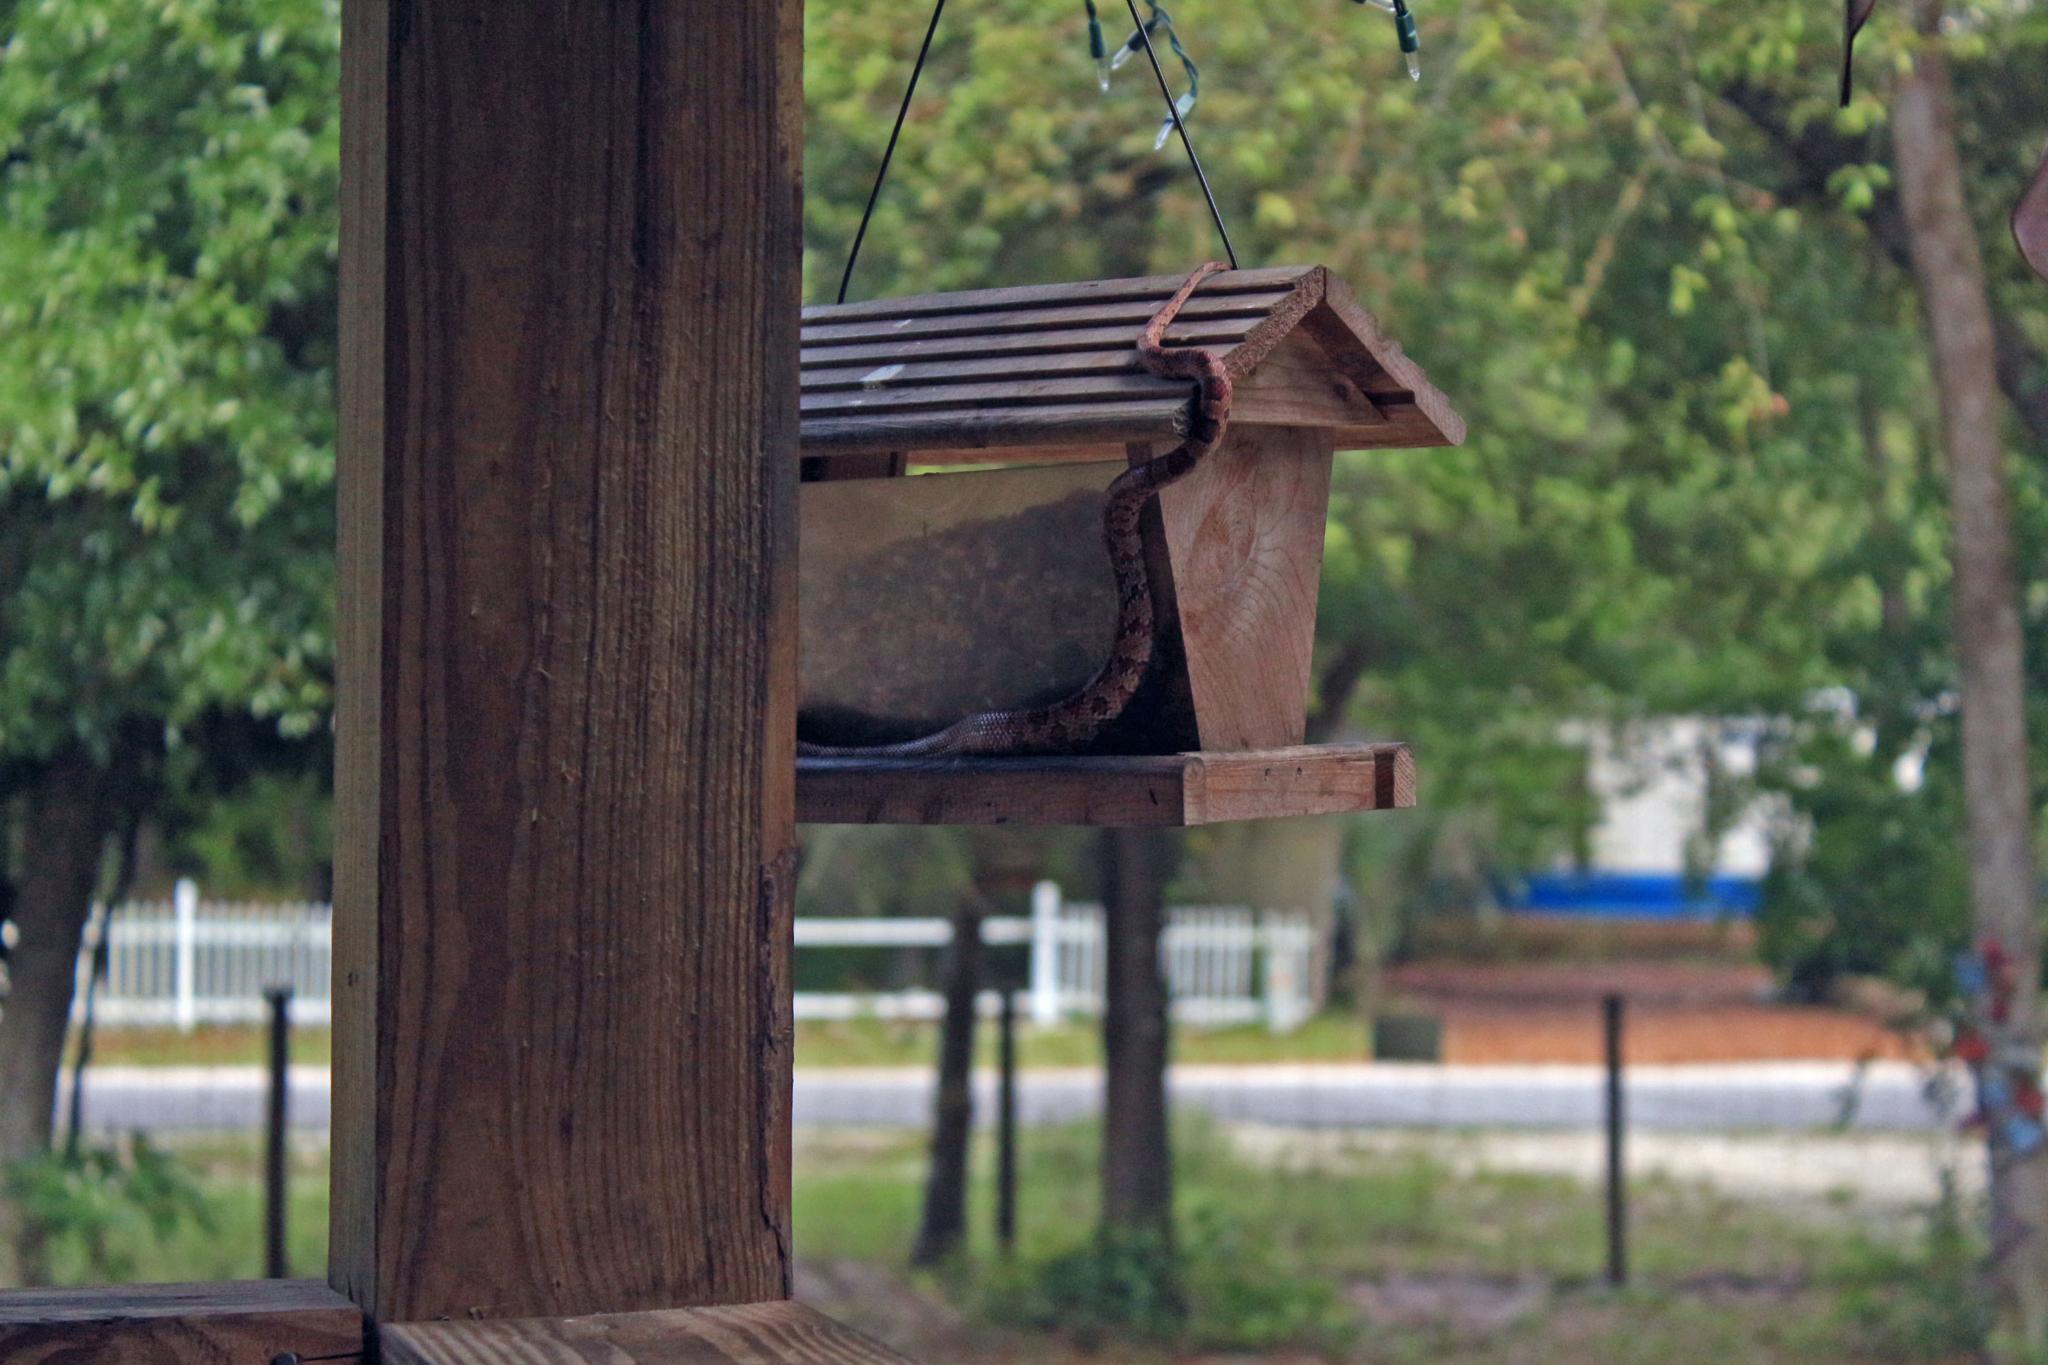 Rat snake in my feeder by Linda L. Offen